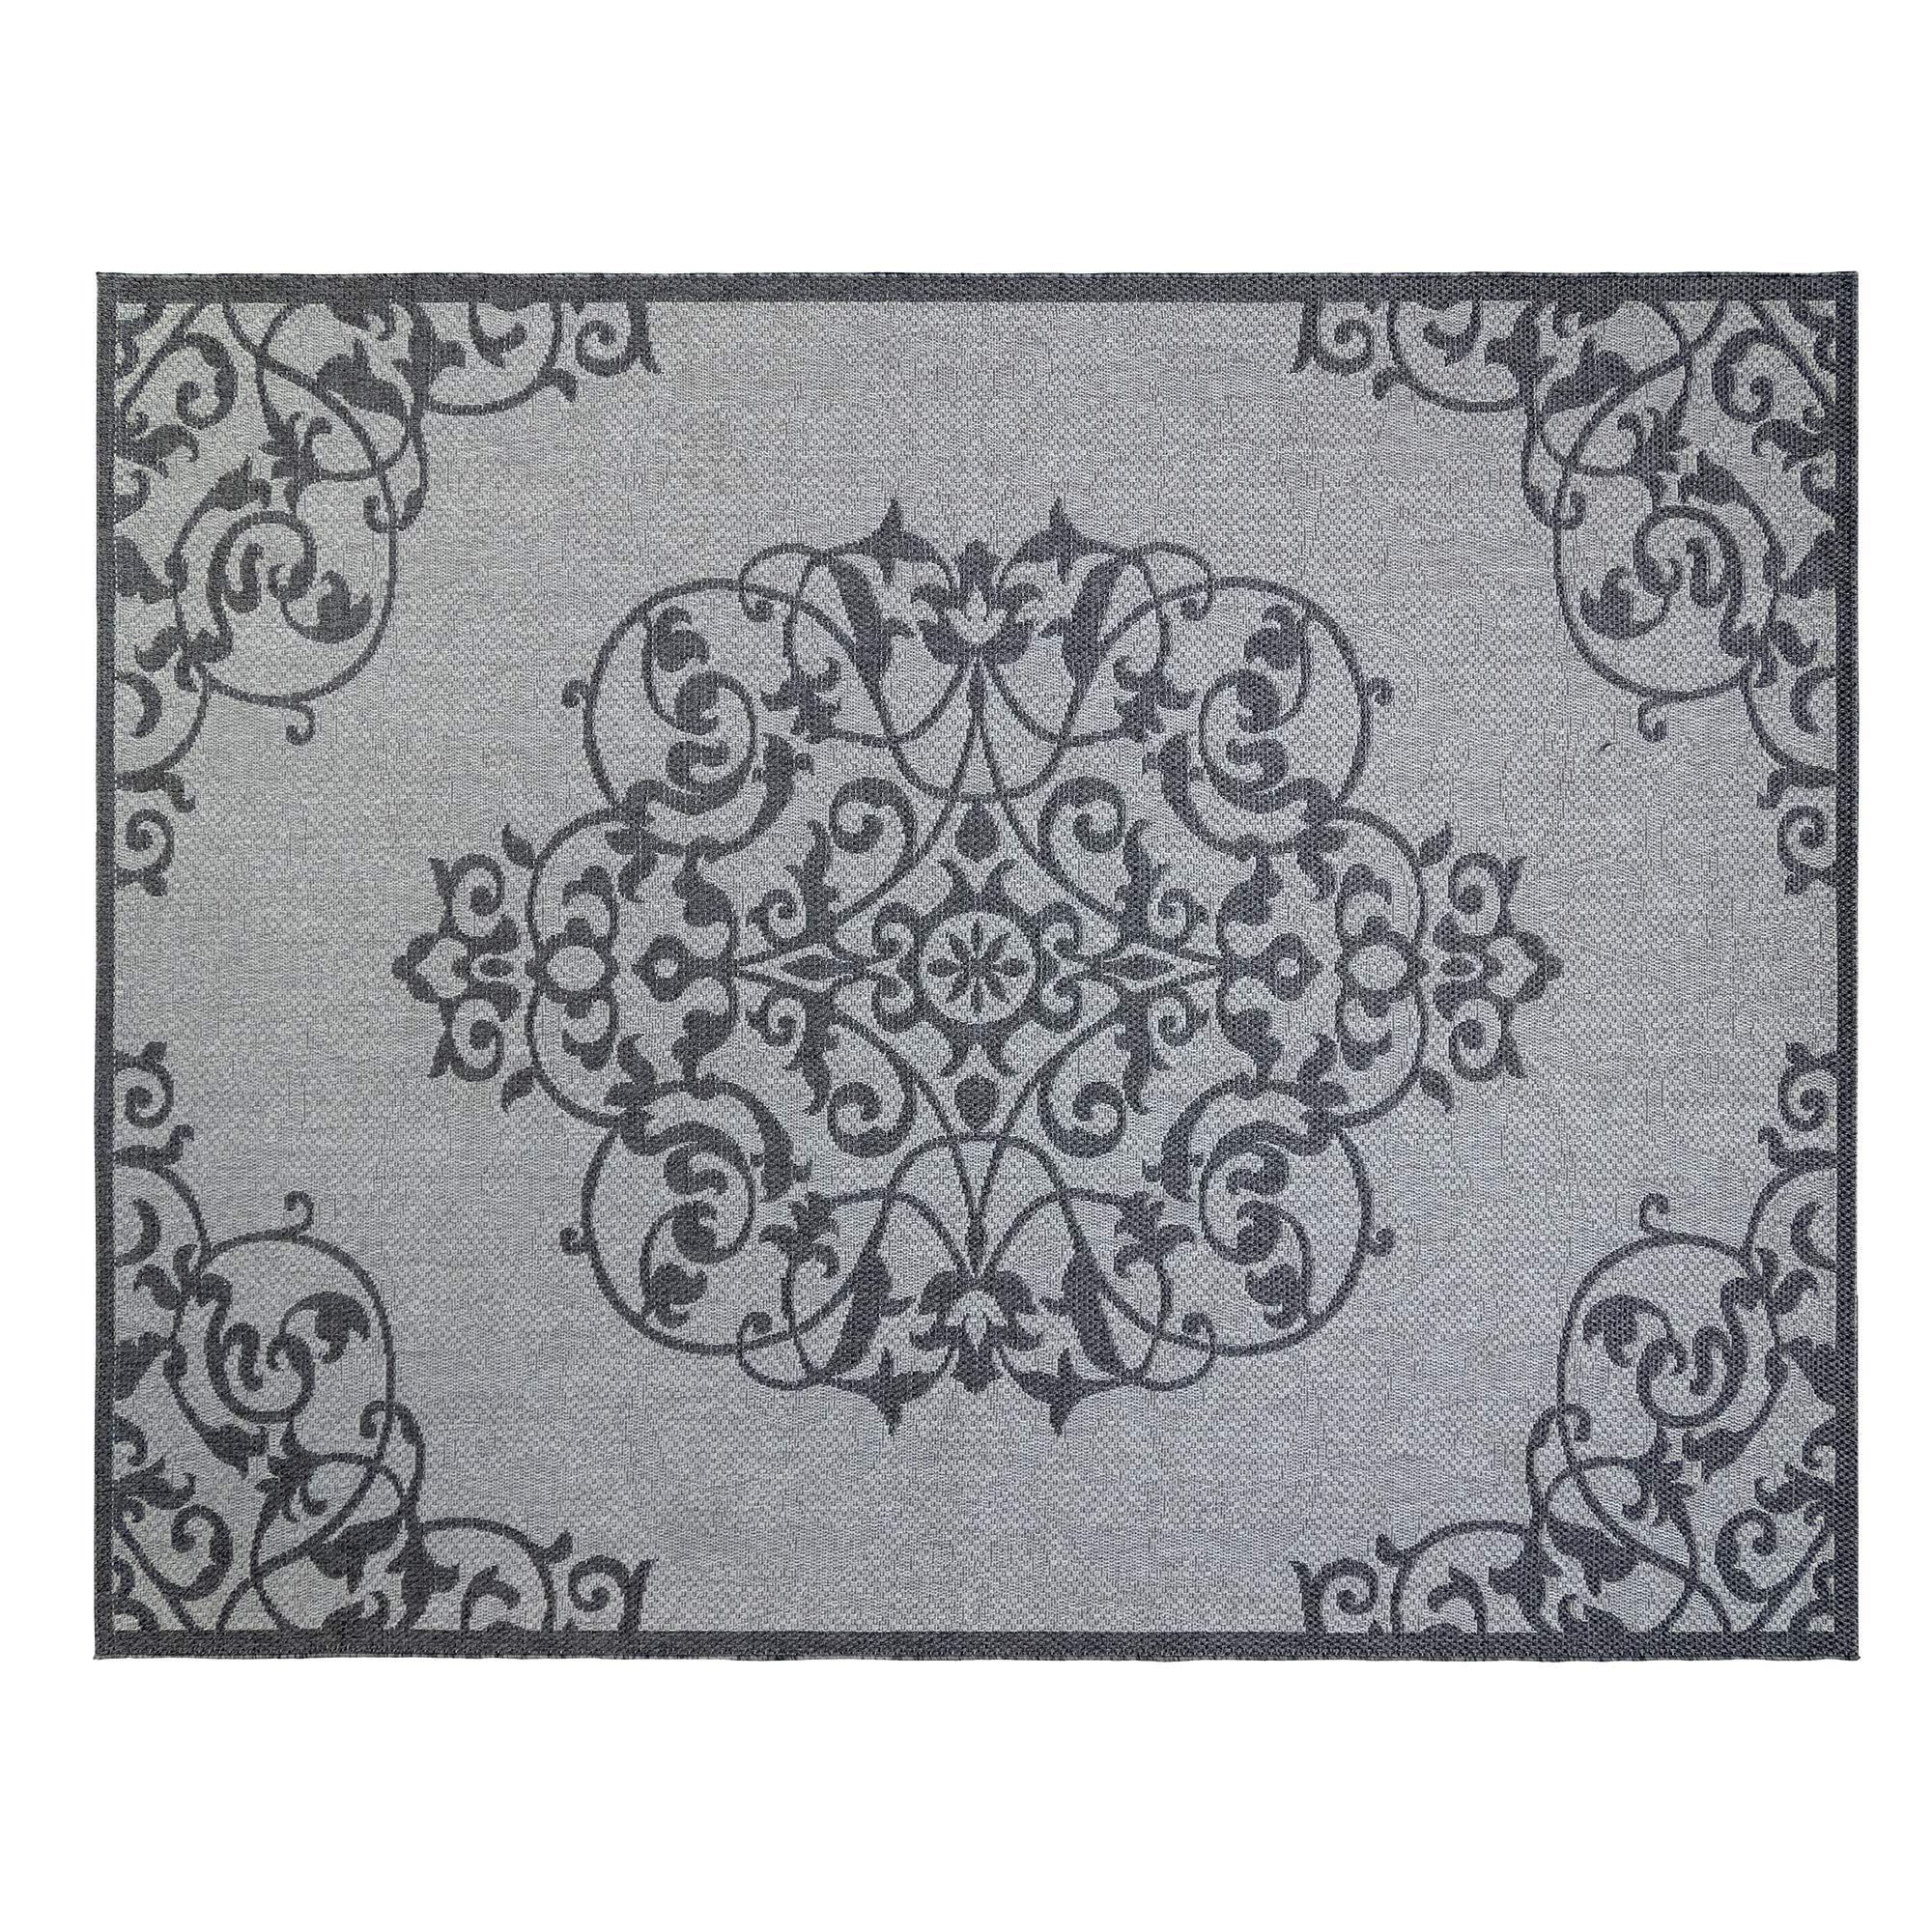 Gertmenian 21609 Space Outdoor Rug Patio Area Carpet, 9x13 X Large Medallion Gray